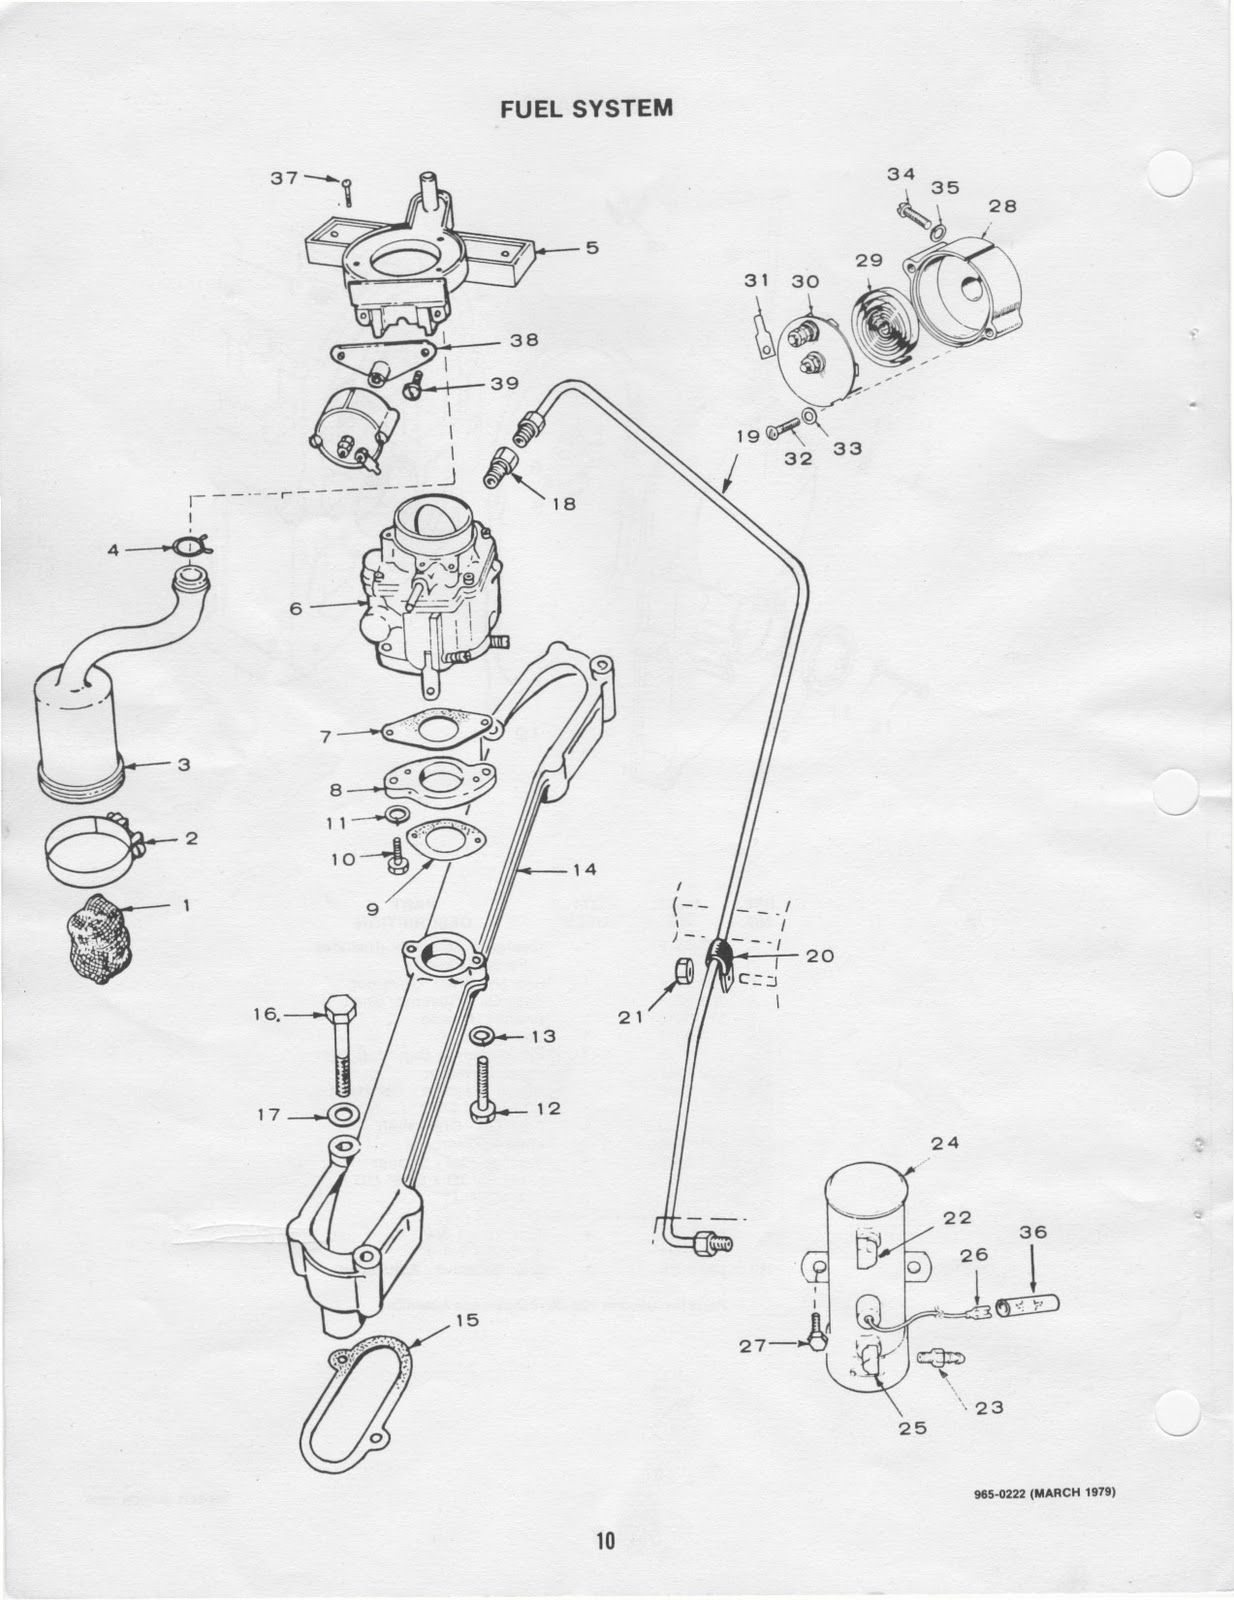 small resolution of 6 5 kw onan wiring diagram onan control board operation onankohler rv generator wiring diagram kohler